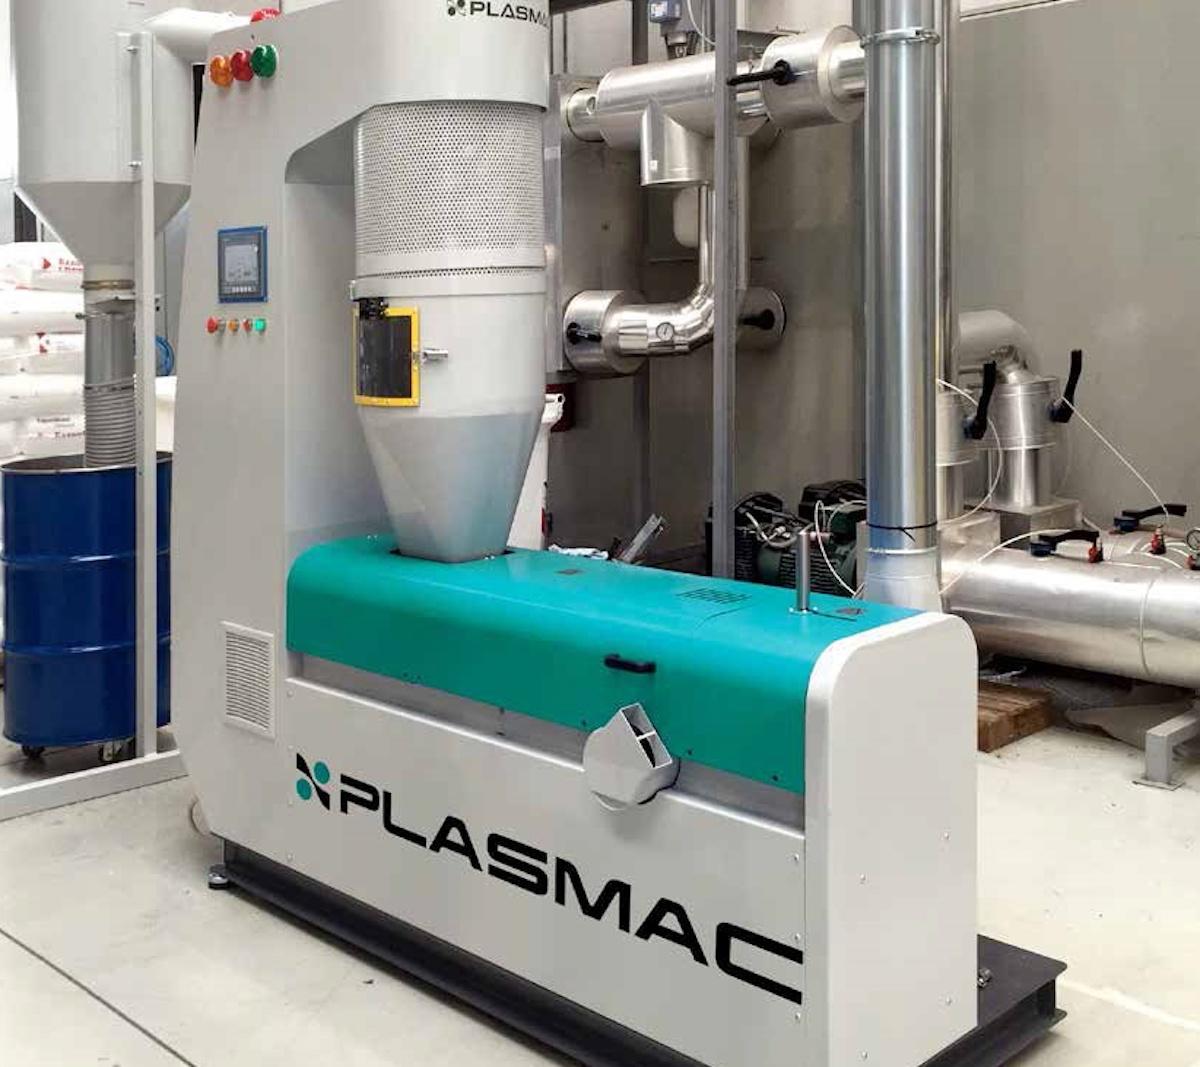 Plasmac